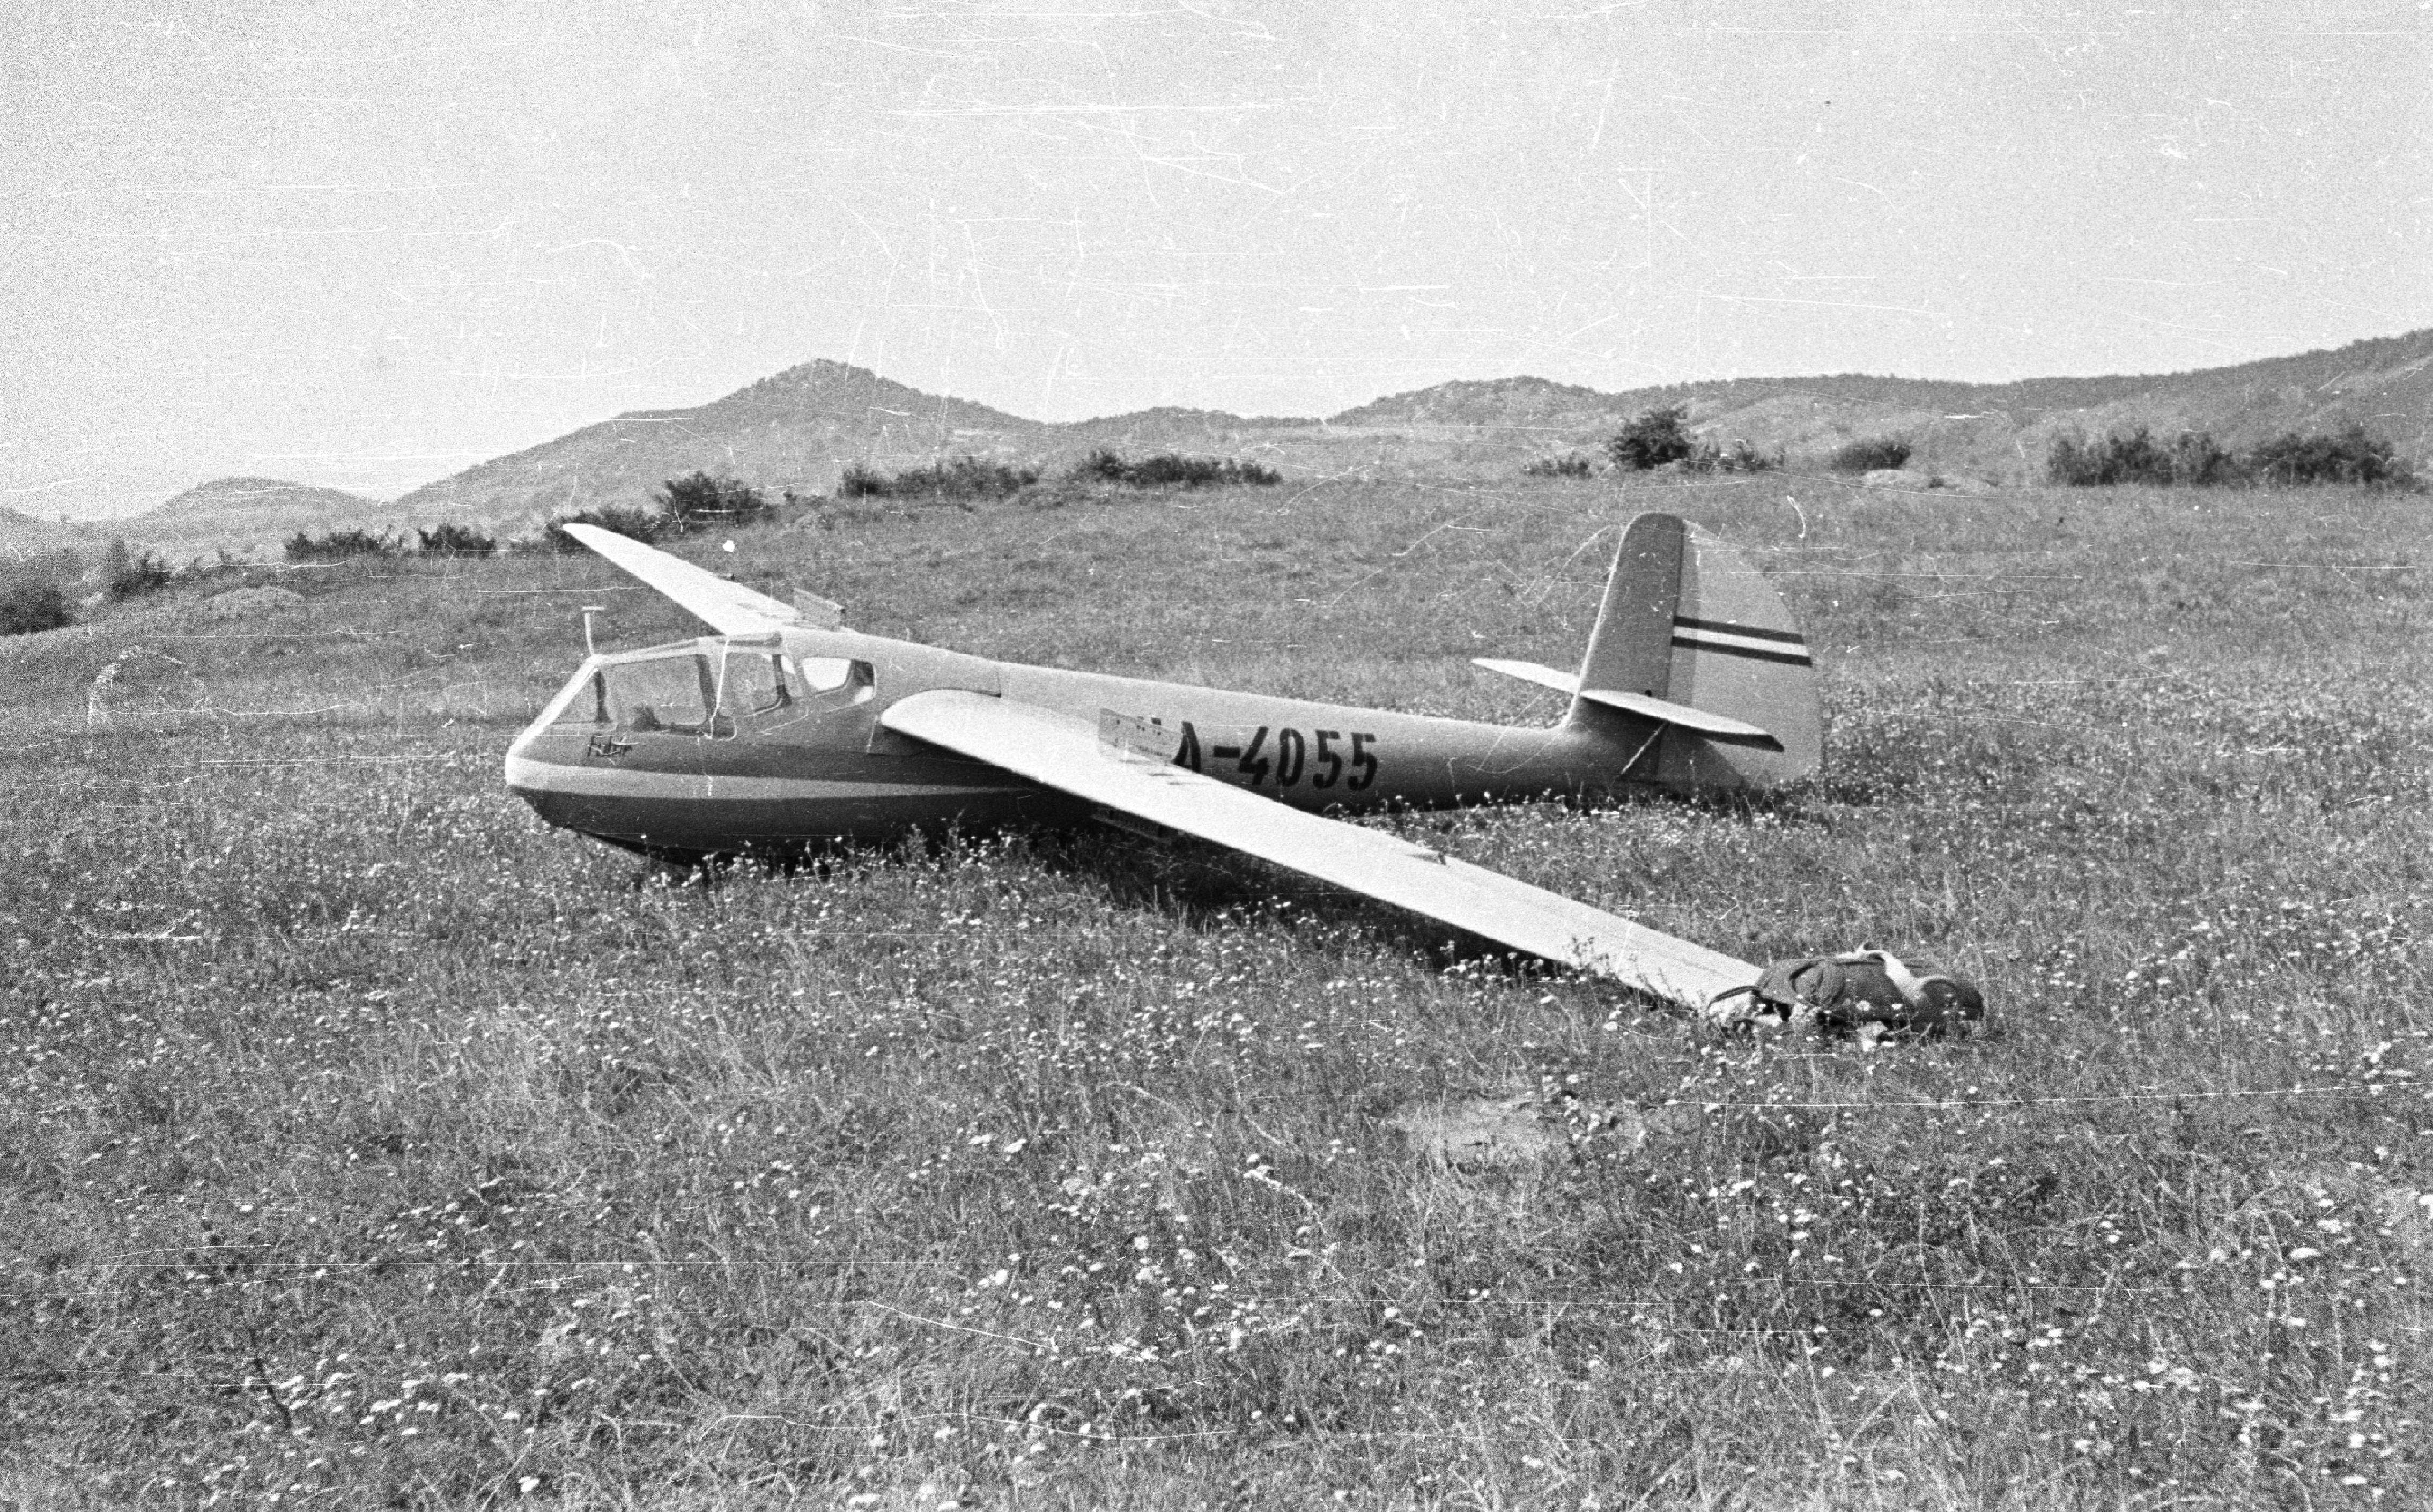 File Rubik R-22 Futár vitorlázó repülőgép. Fortepan 29807.jpg ... b45b462d63